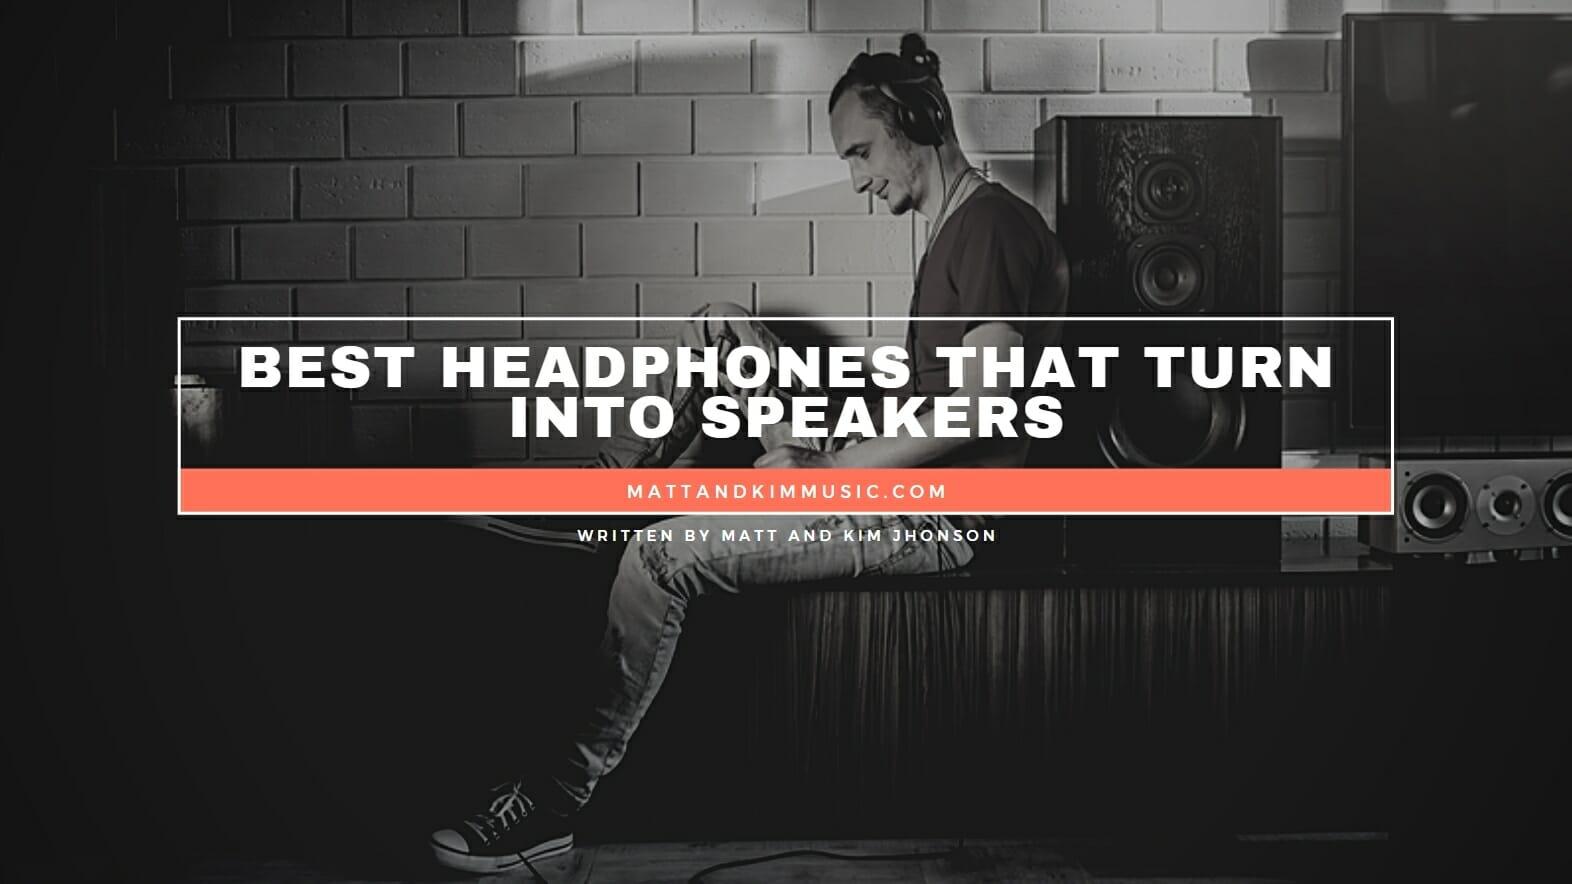 Best Headphones That Turn Into Speakers